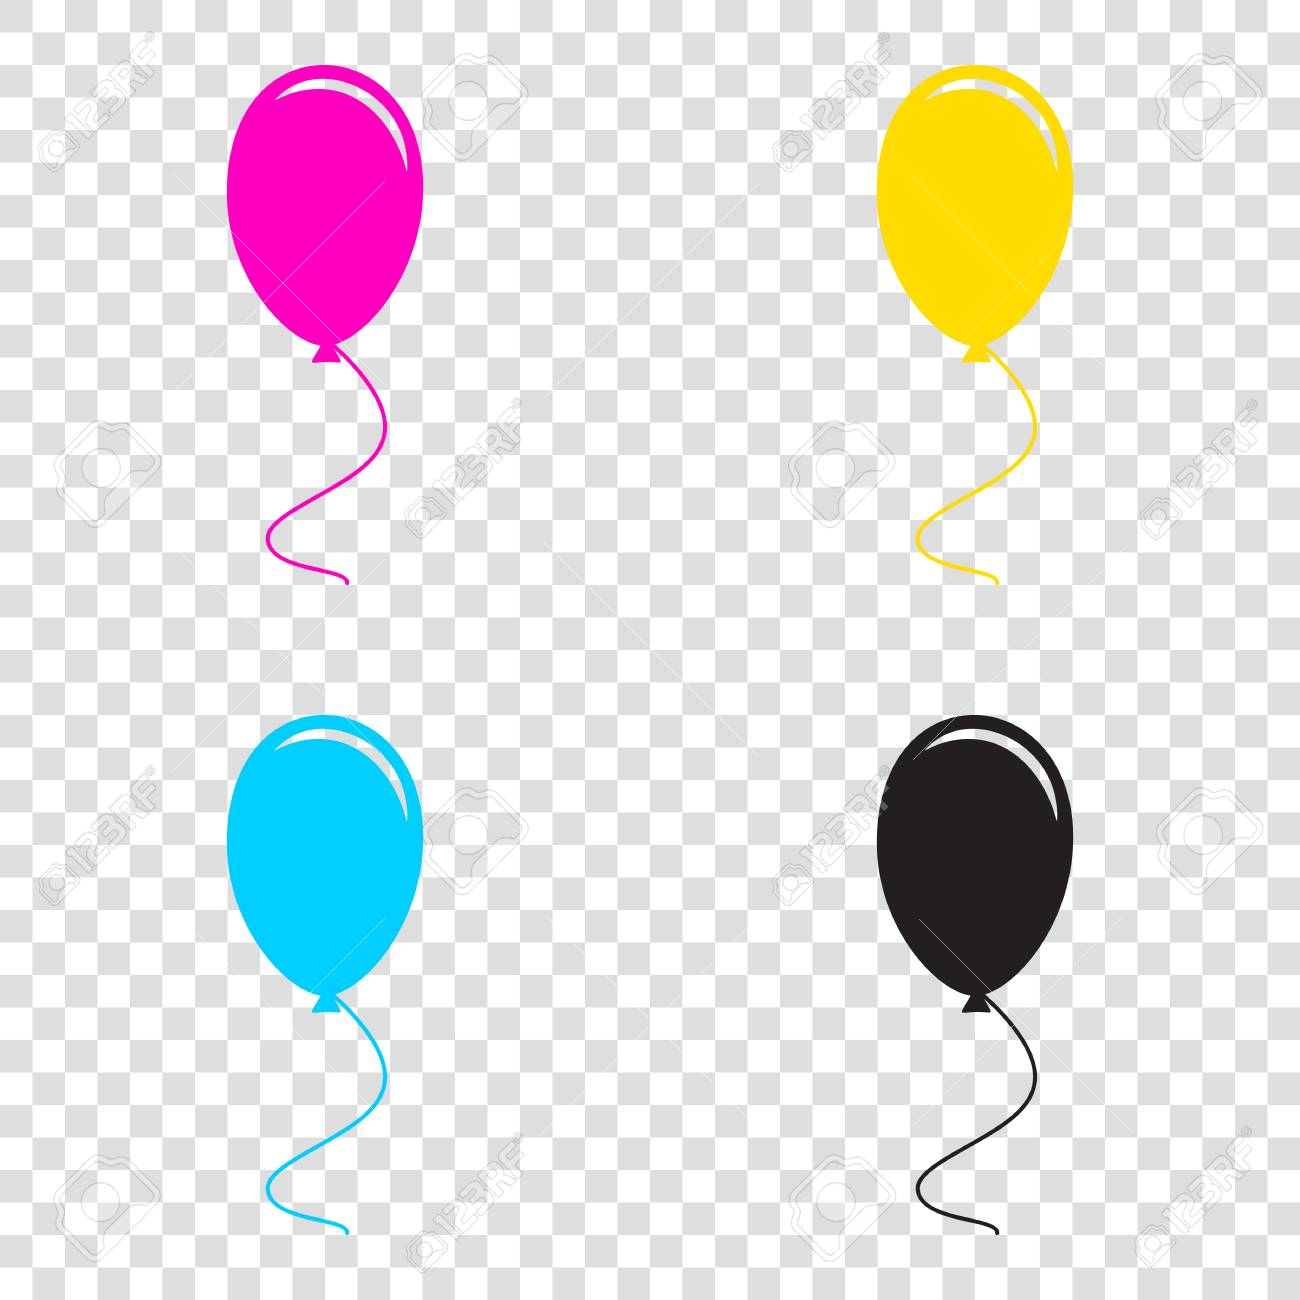 Balloon sign illustration  CMYK icons on transparent background